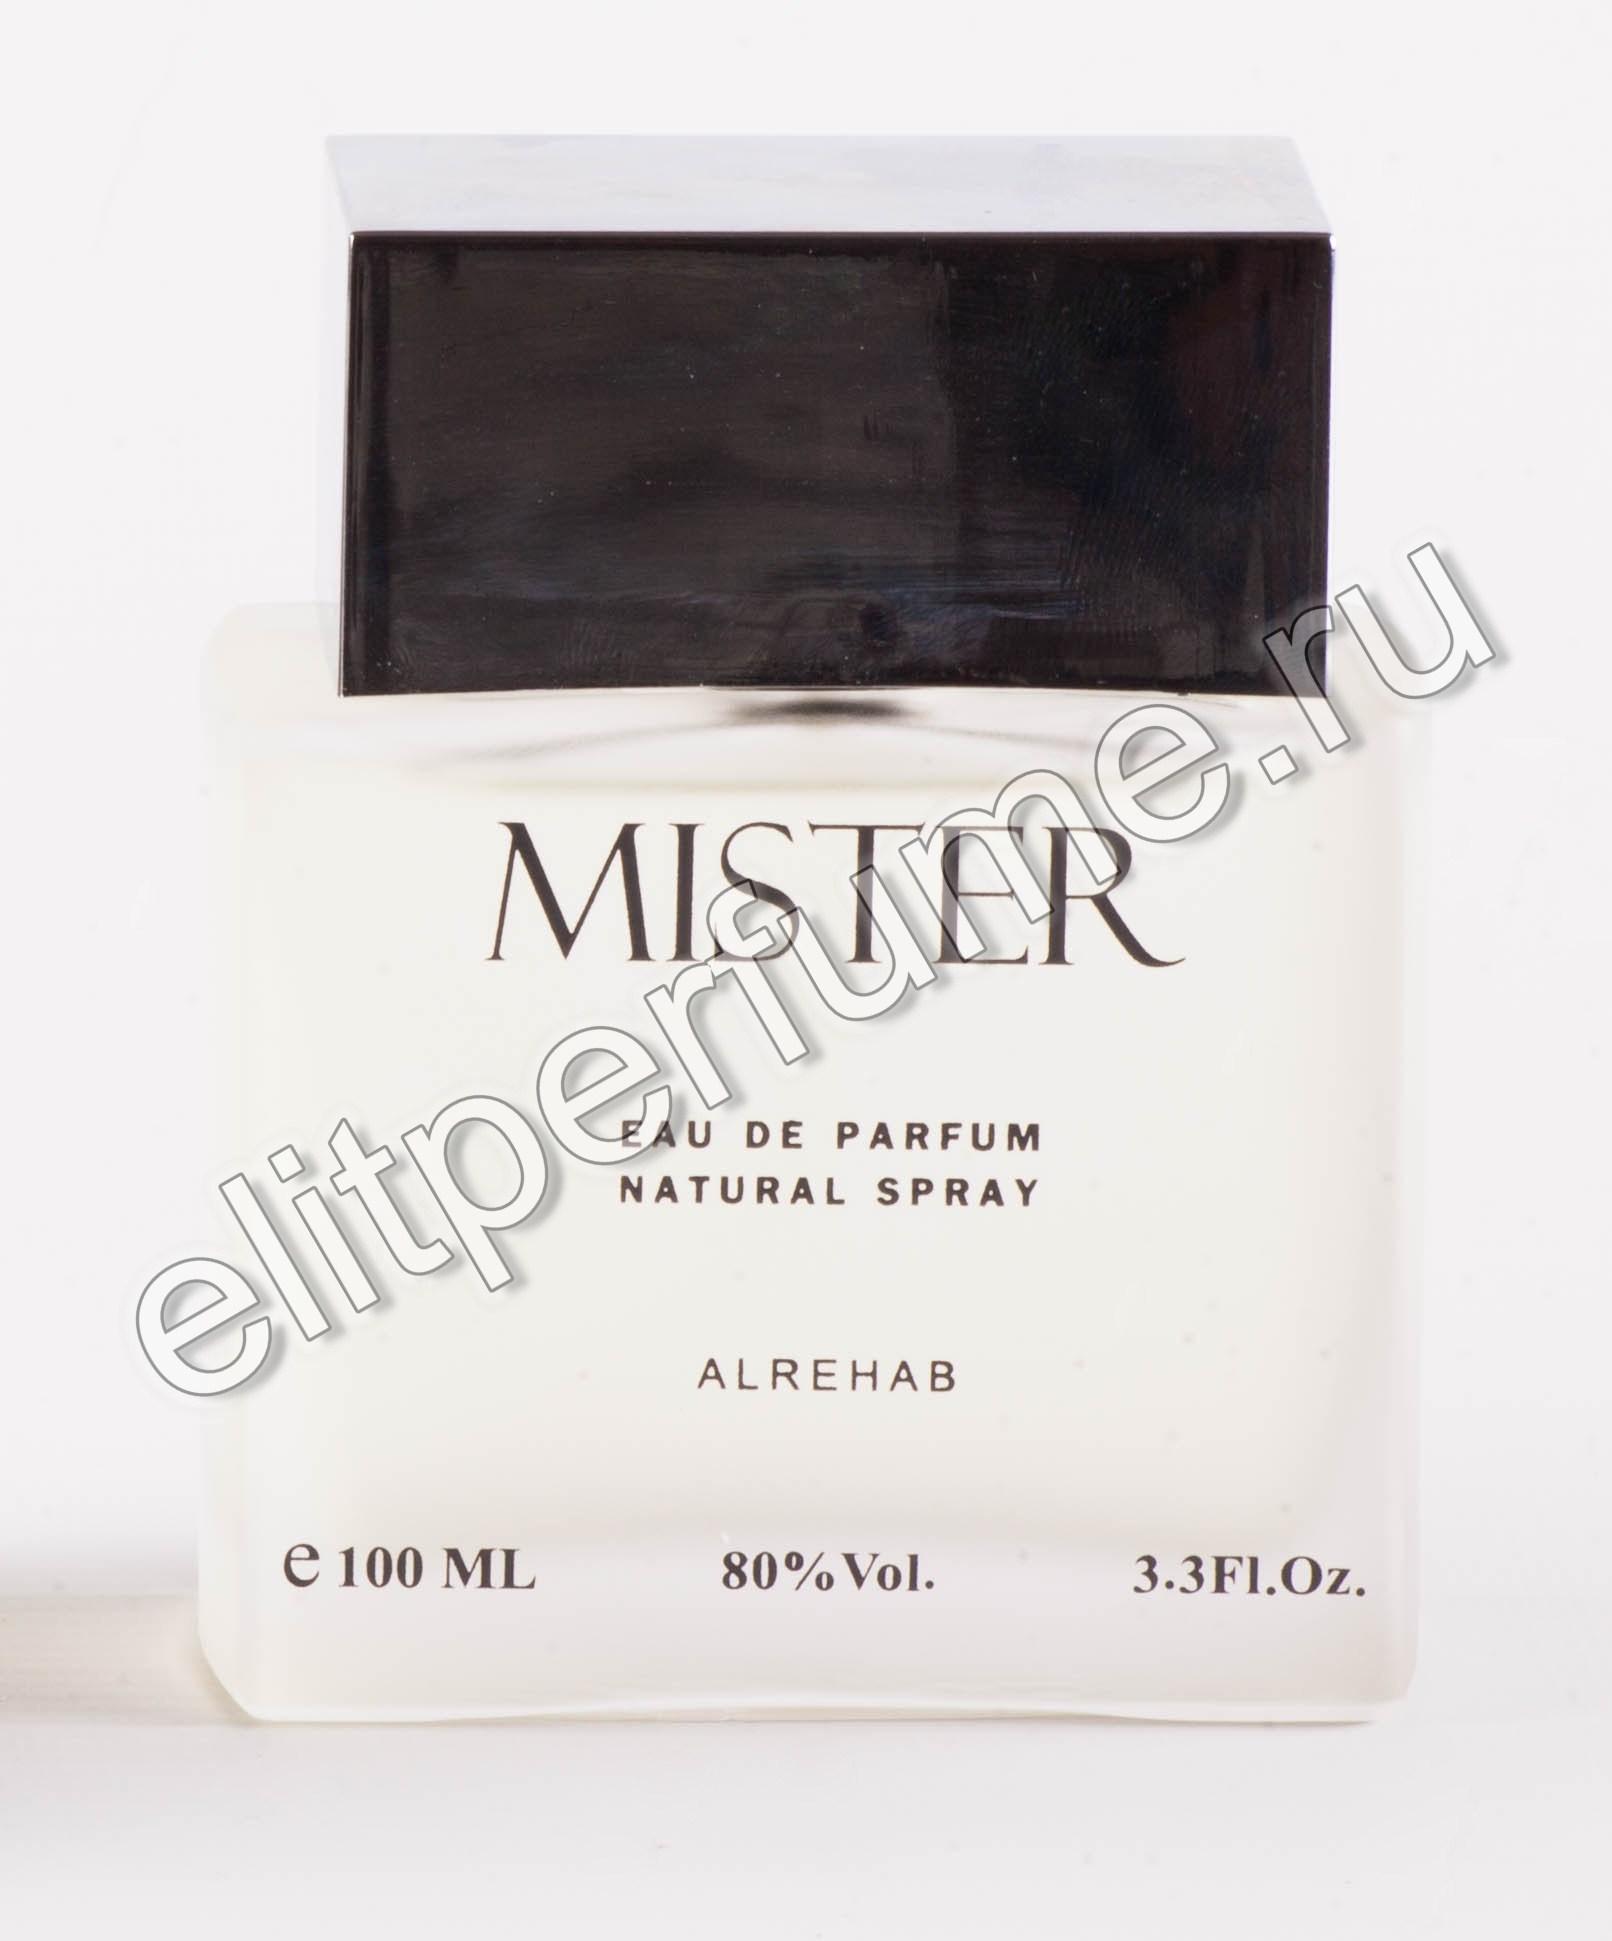 Mister Мистер 100 мл спрей от Аль Рехаб Al Rehab